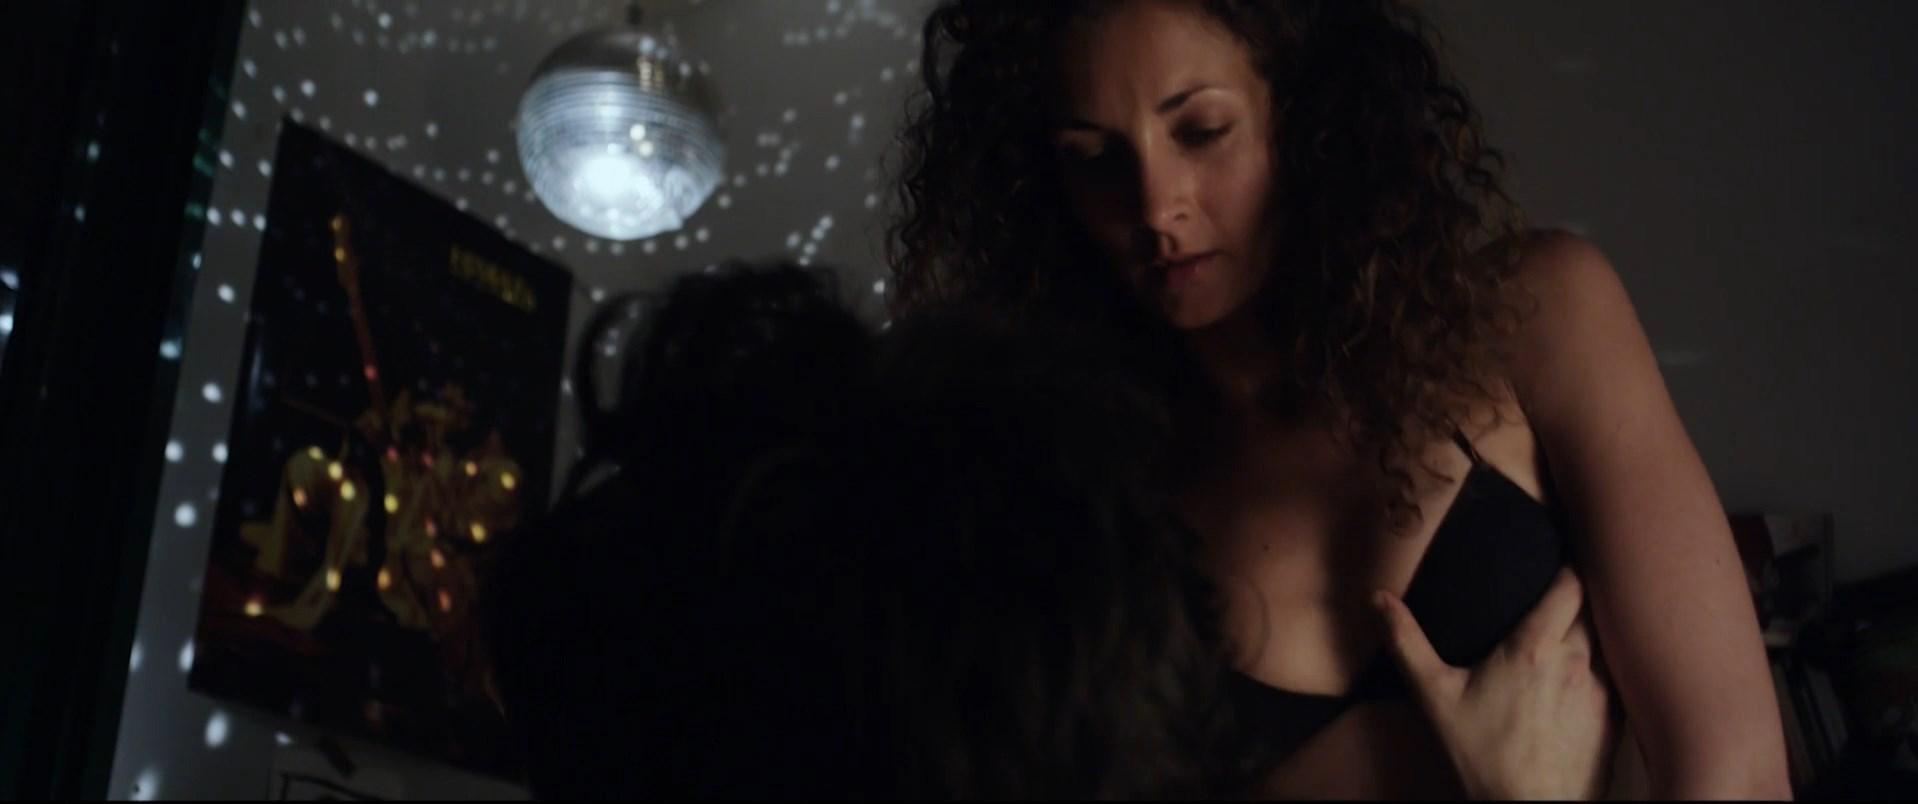 Irene Anula sexy - Como conoci a tu padre (2009)